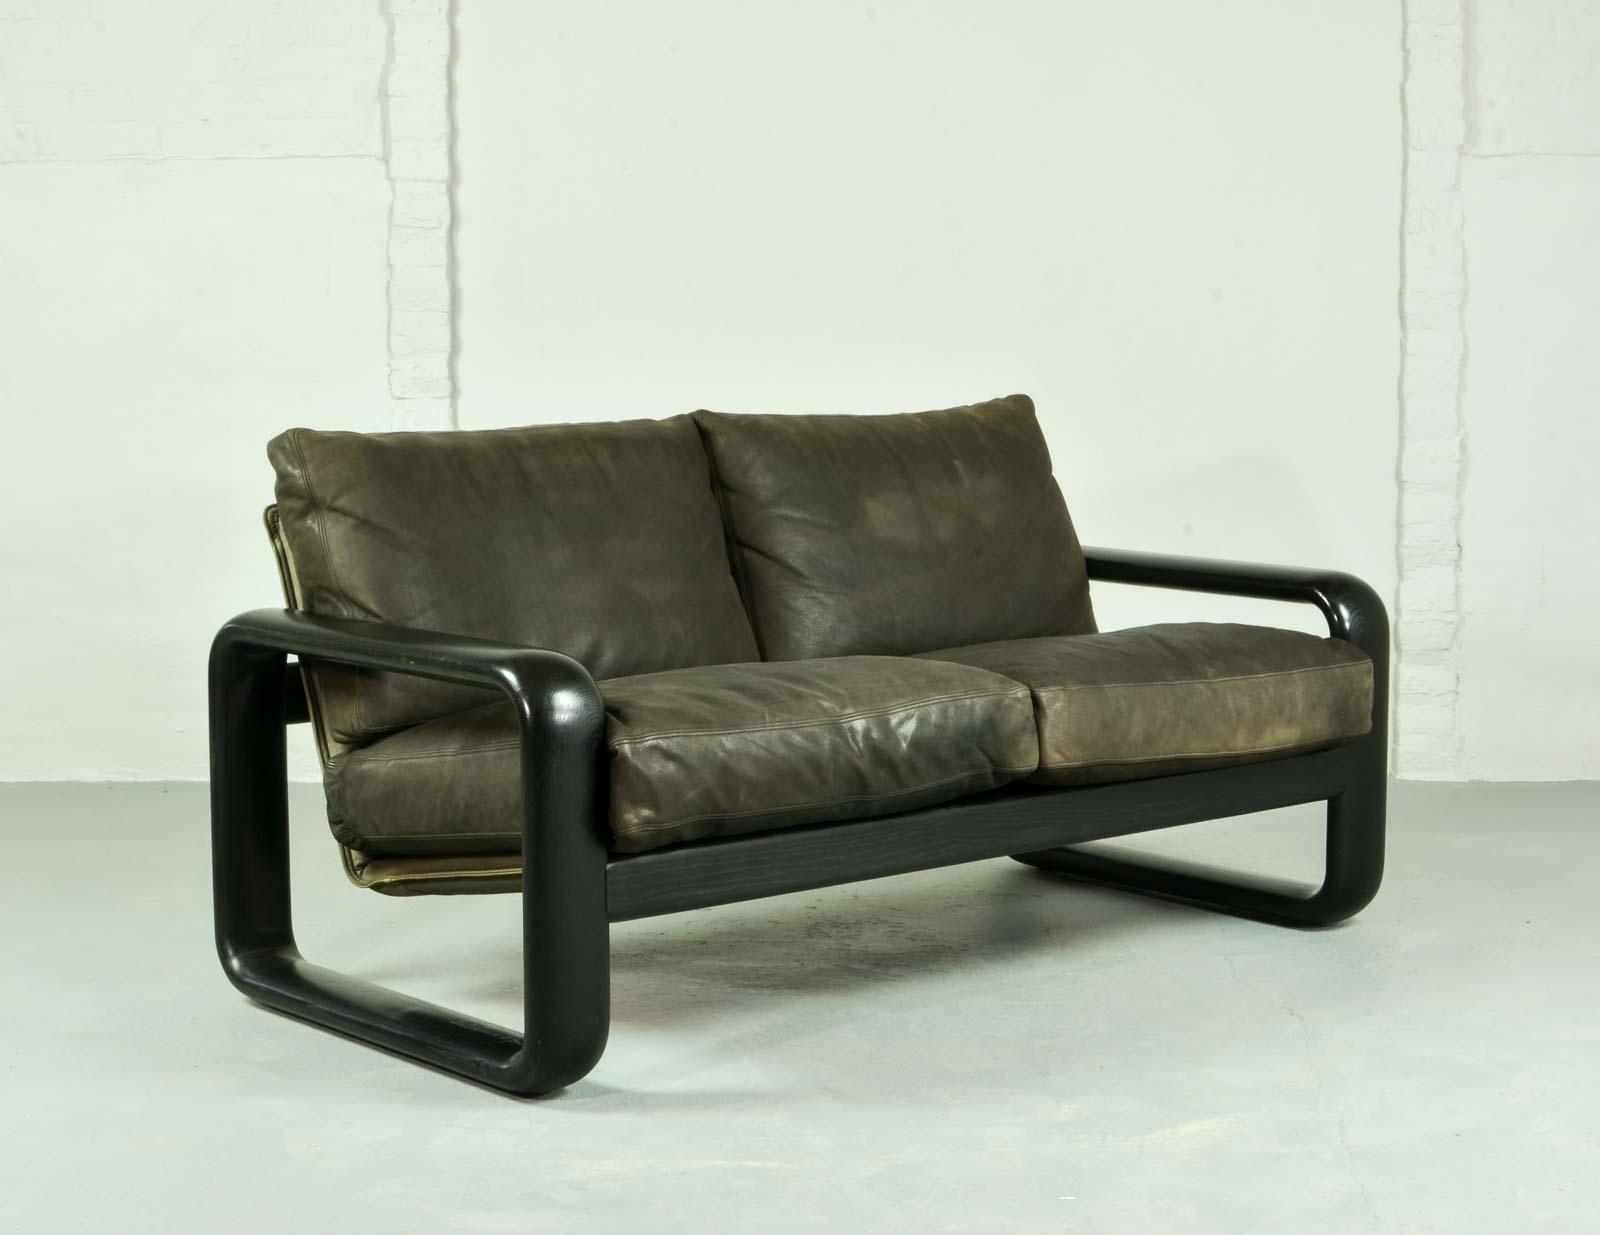 Mid Century Leather Sofa U0027Hombreu0027 By Burkhard Vogtherr For Rosenthal Studio  Line